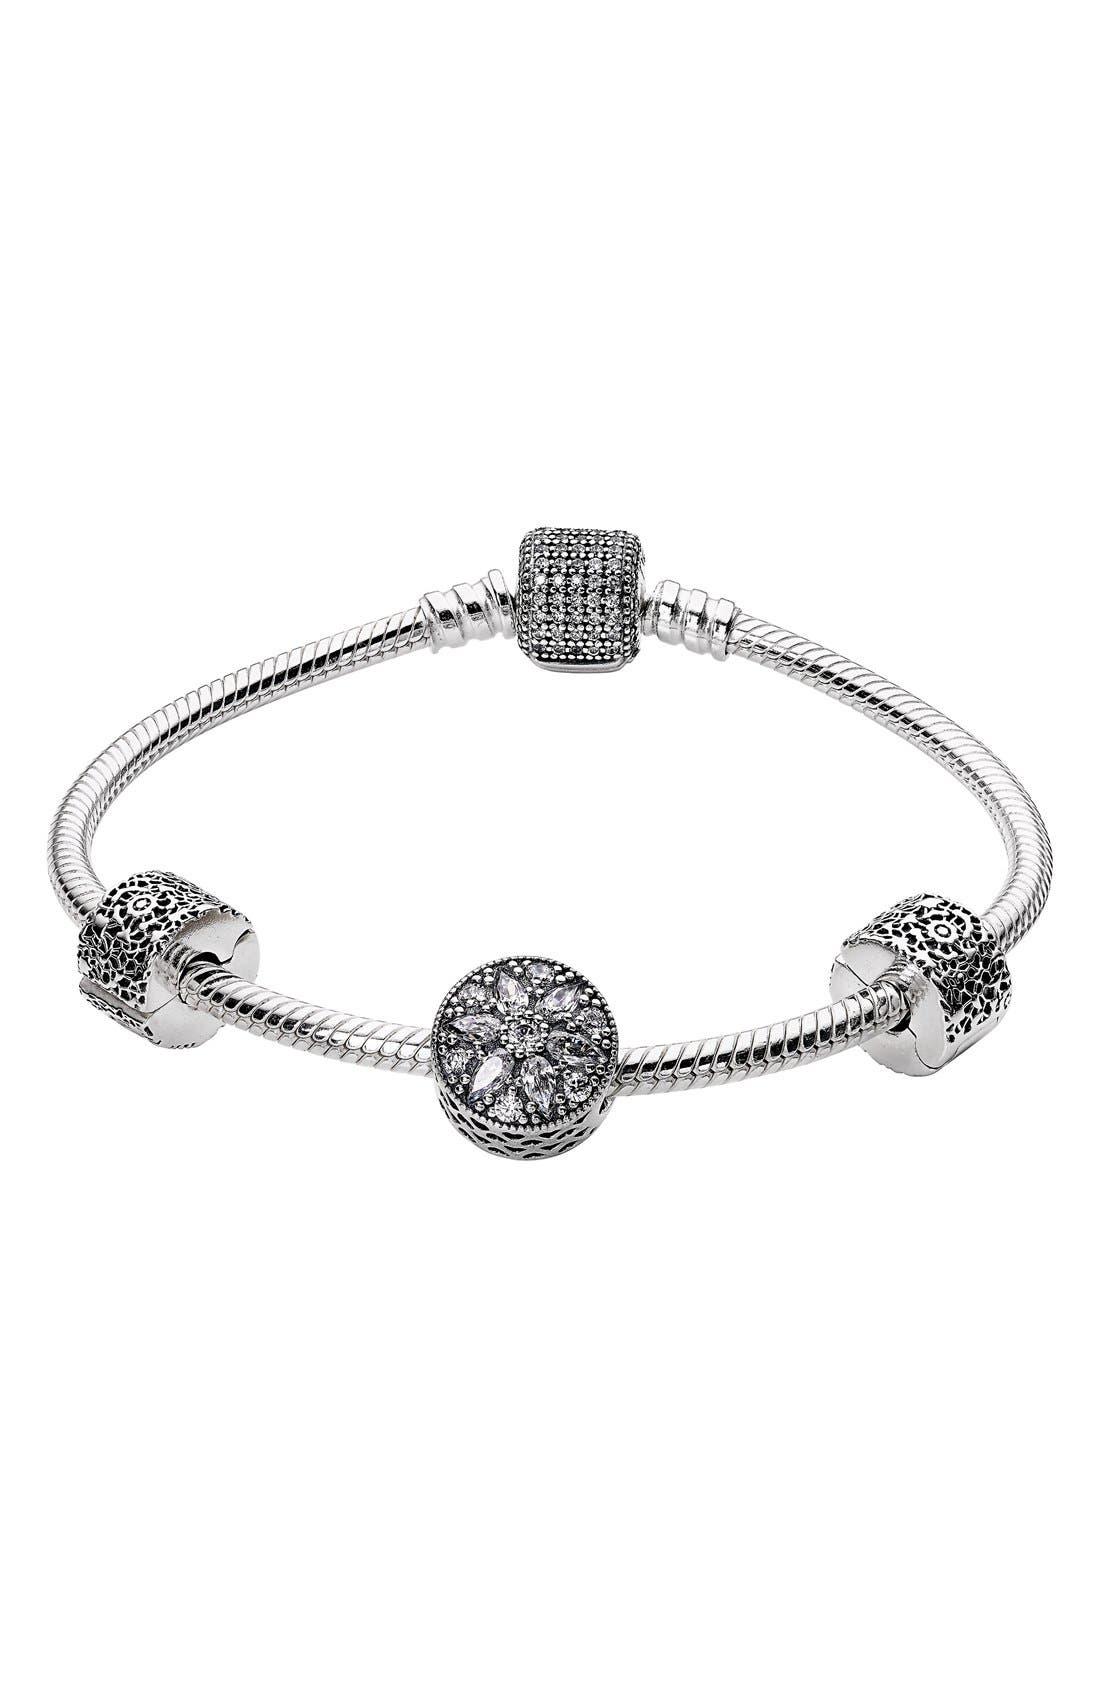 Main Image - Pandora 'Glistening Wonder' Bracelet Gift Set ($240 Value)